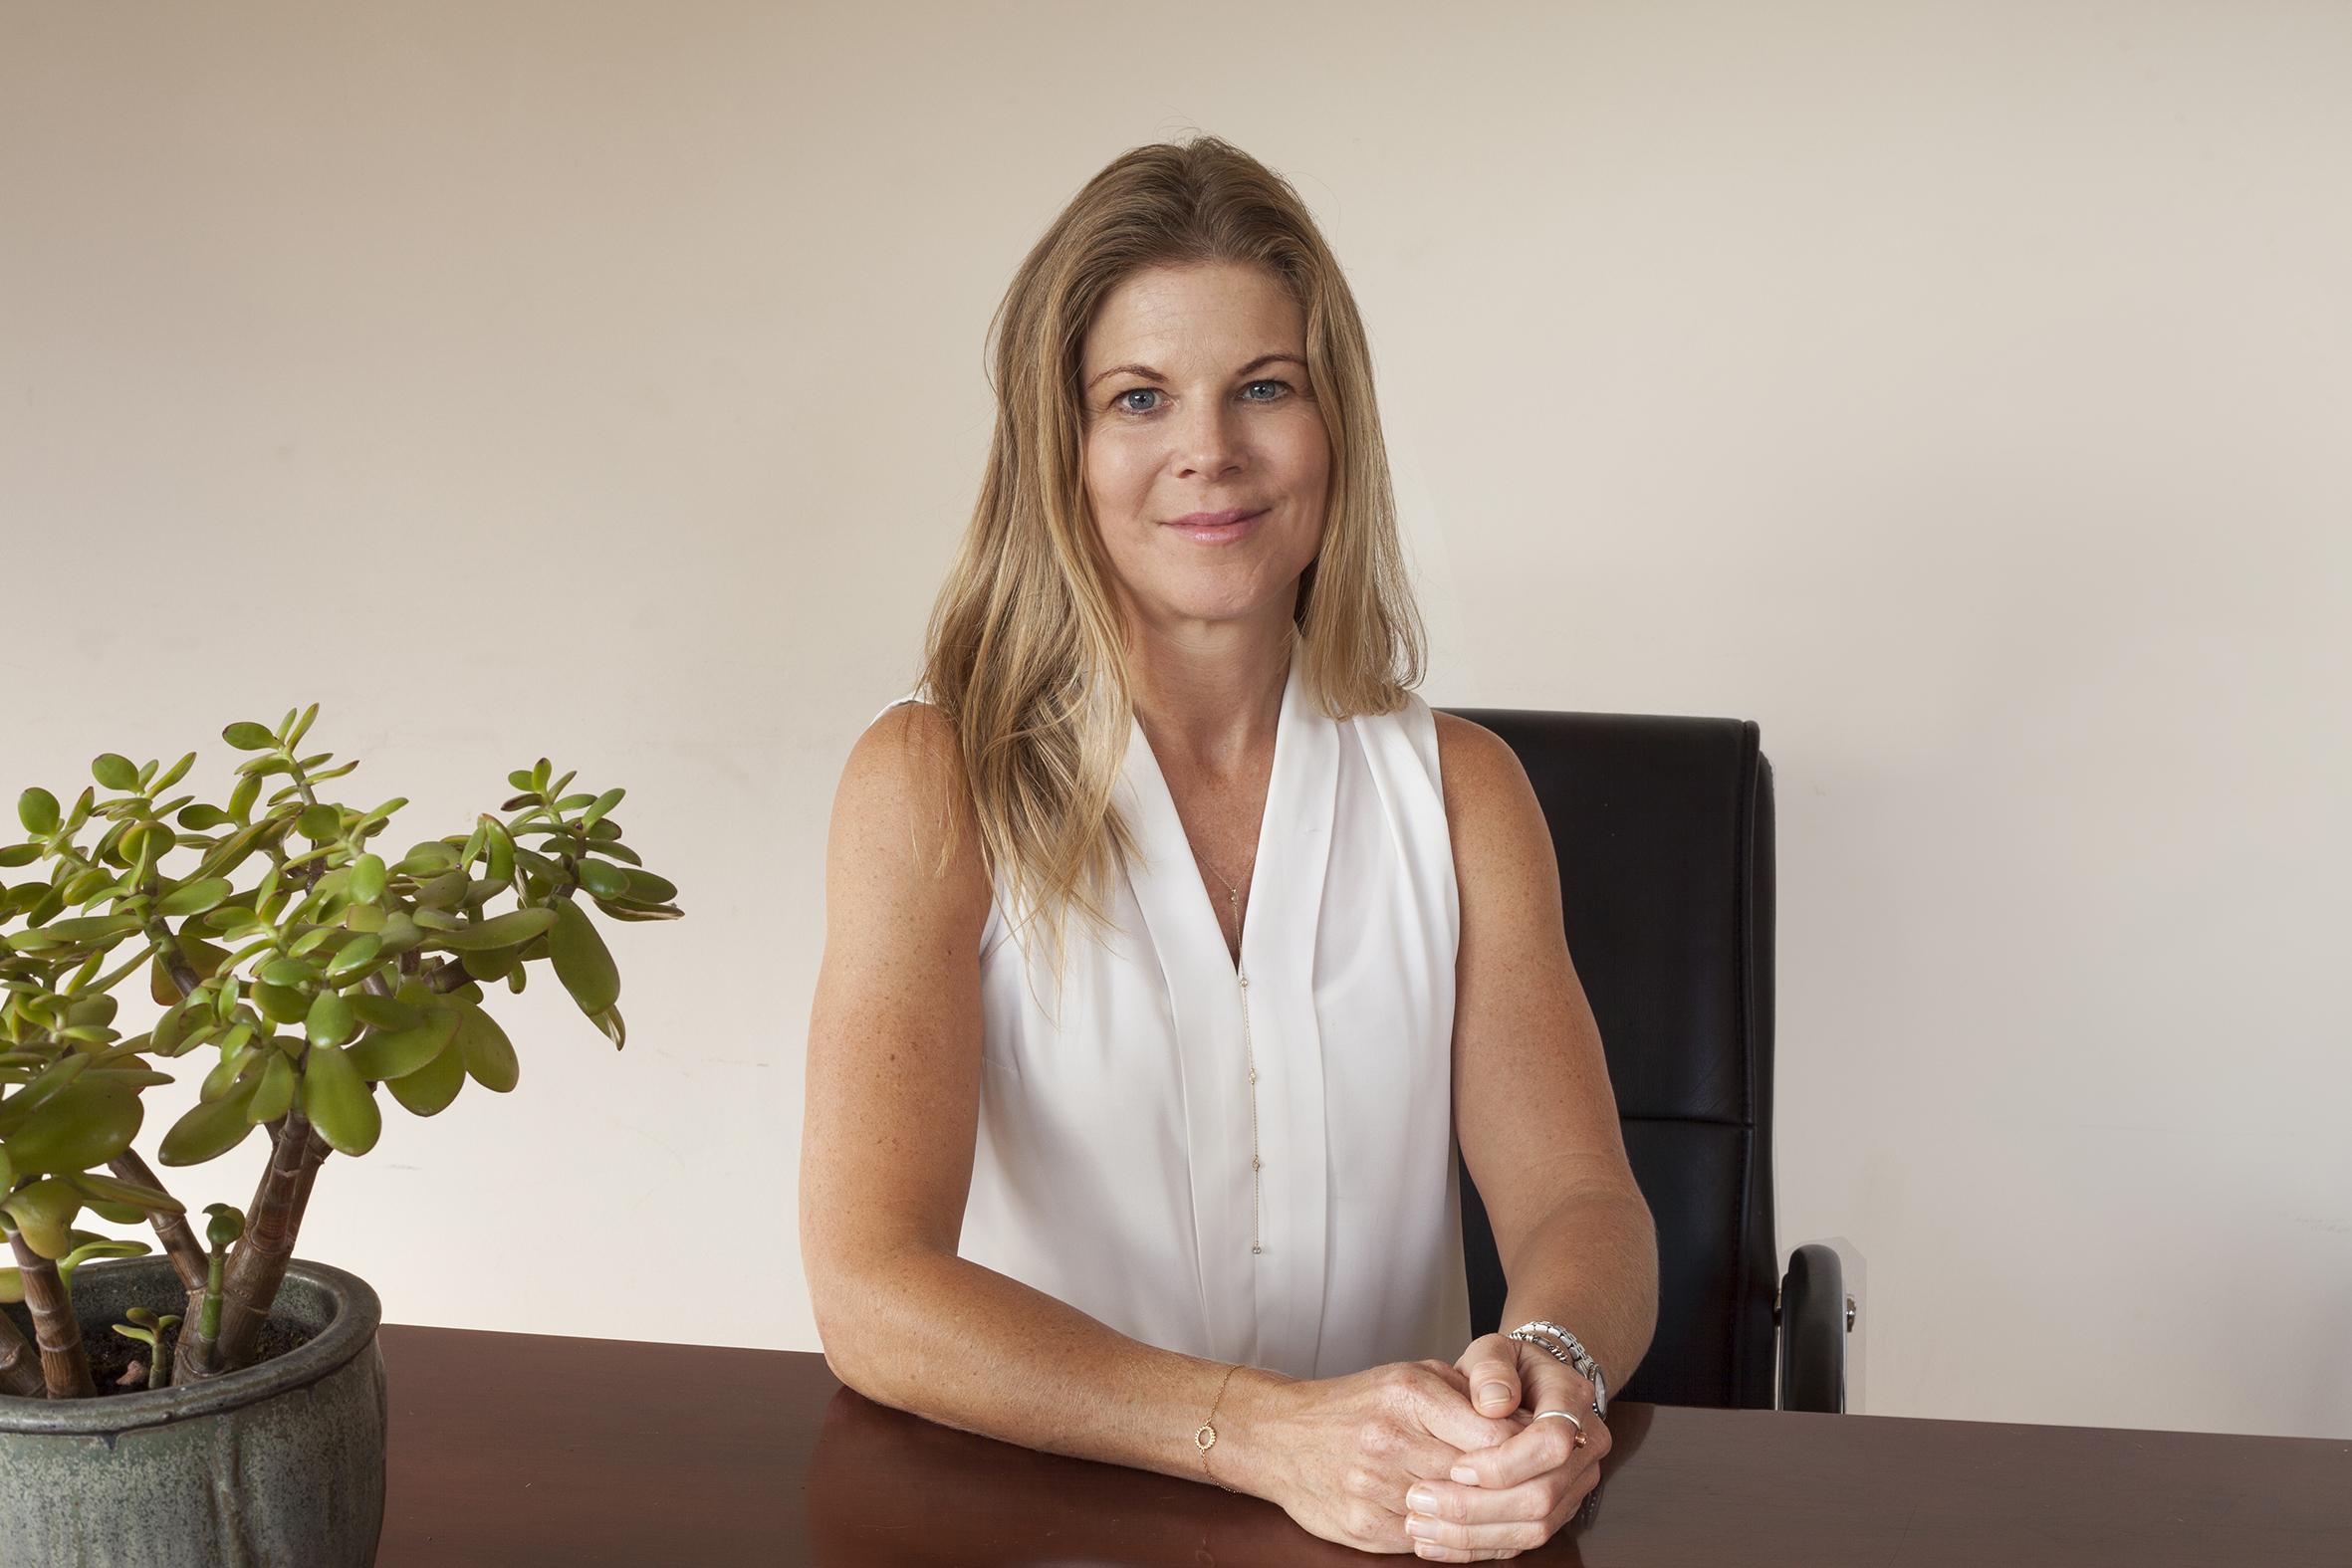 Sylvia-yoga-corporate-mindfulness-classes